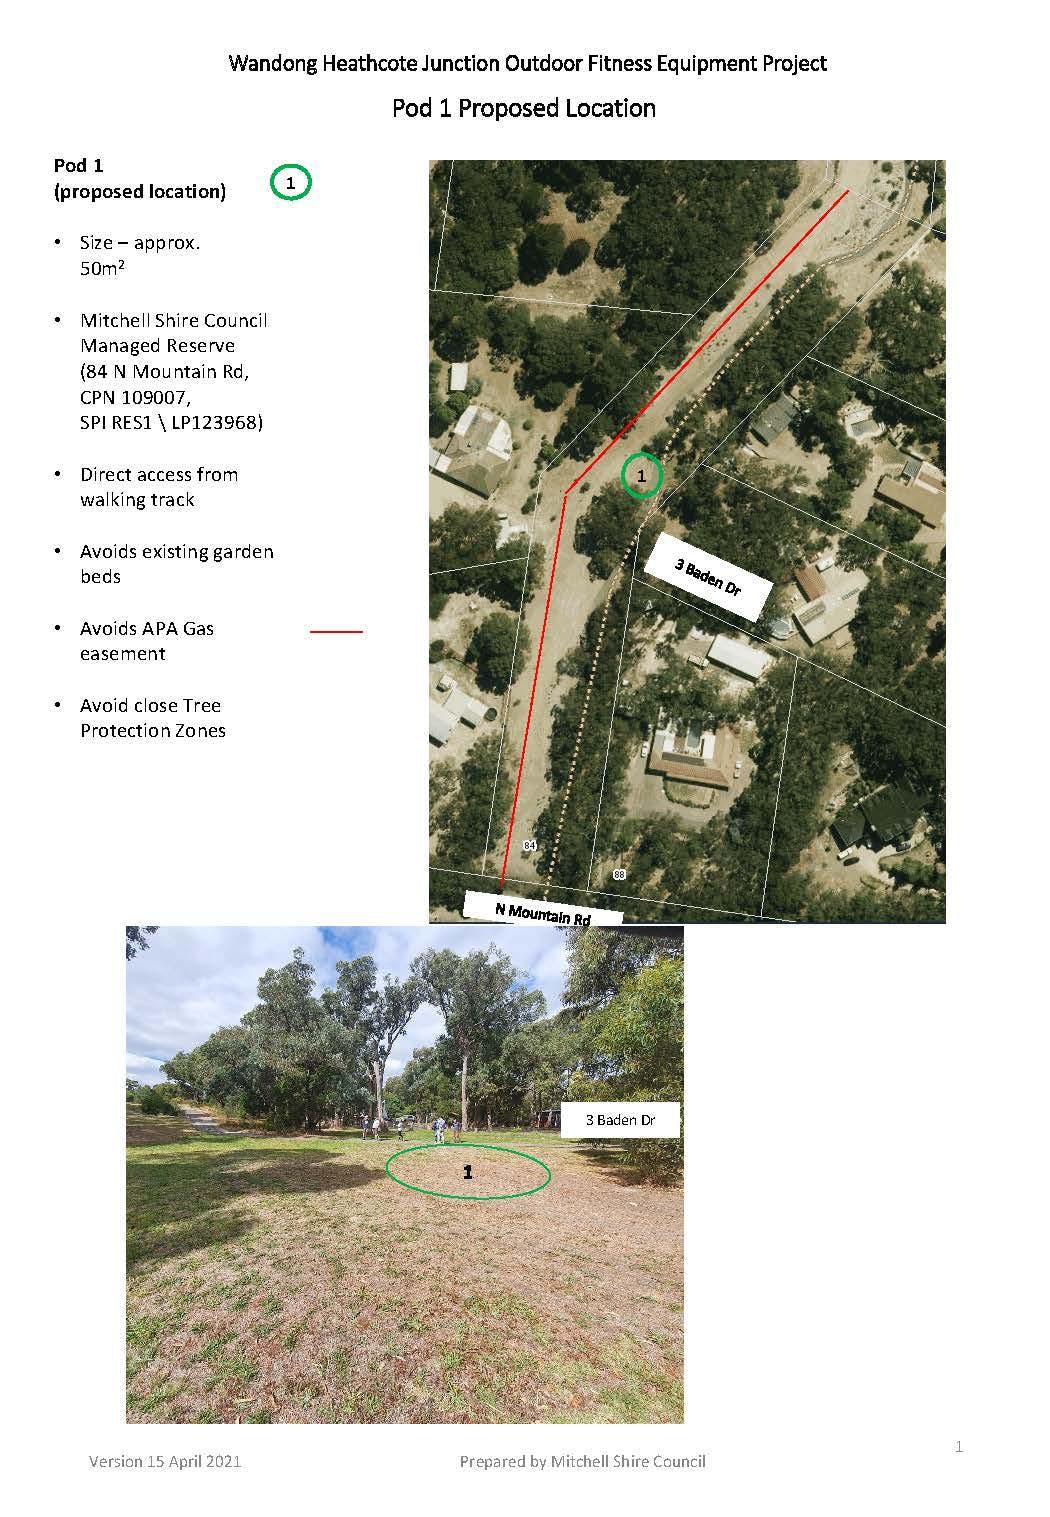 WDHJ Proposed Pod locations Apr2021_Page_1.jpg